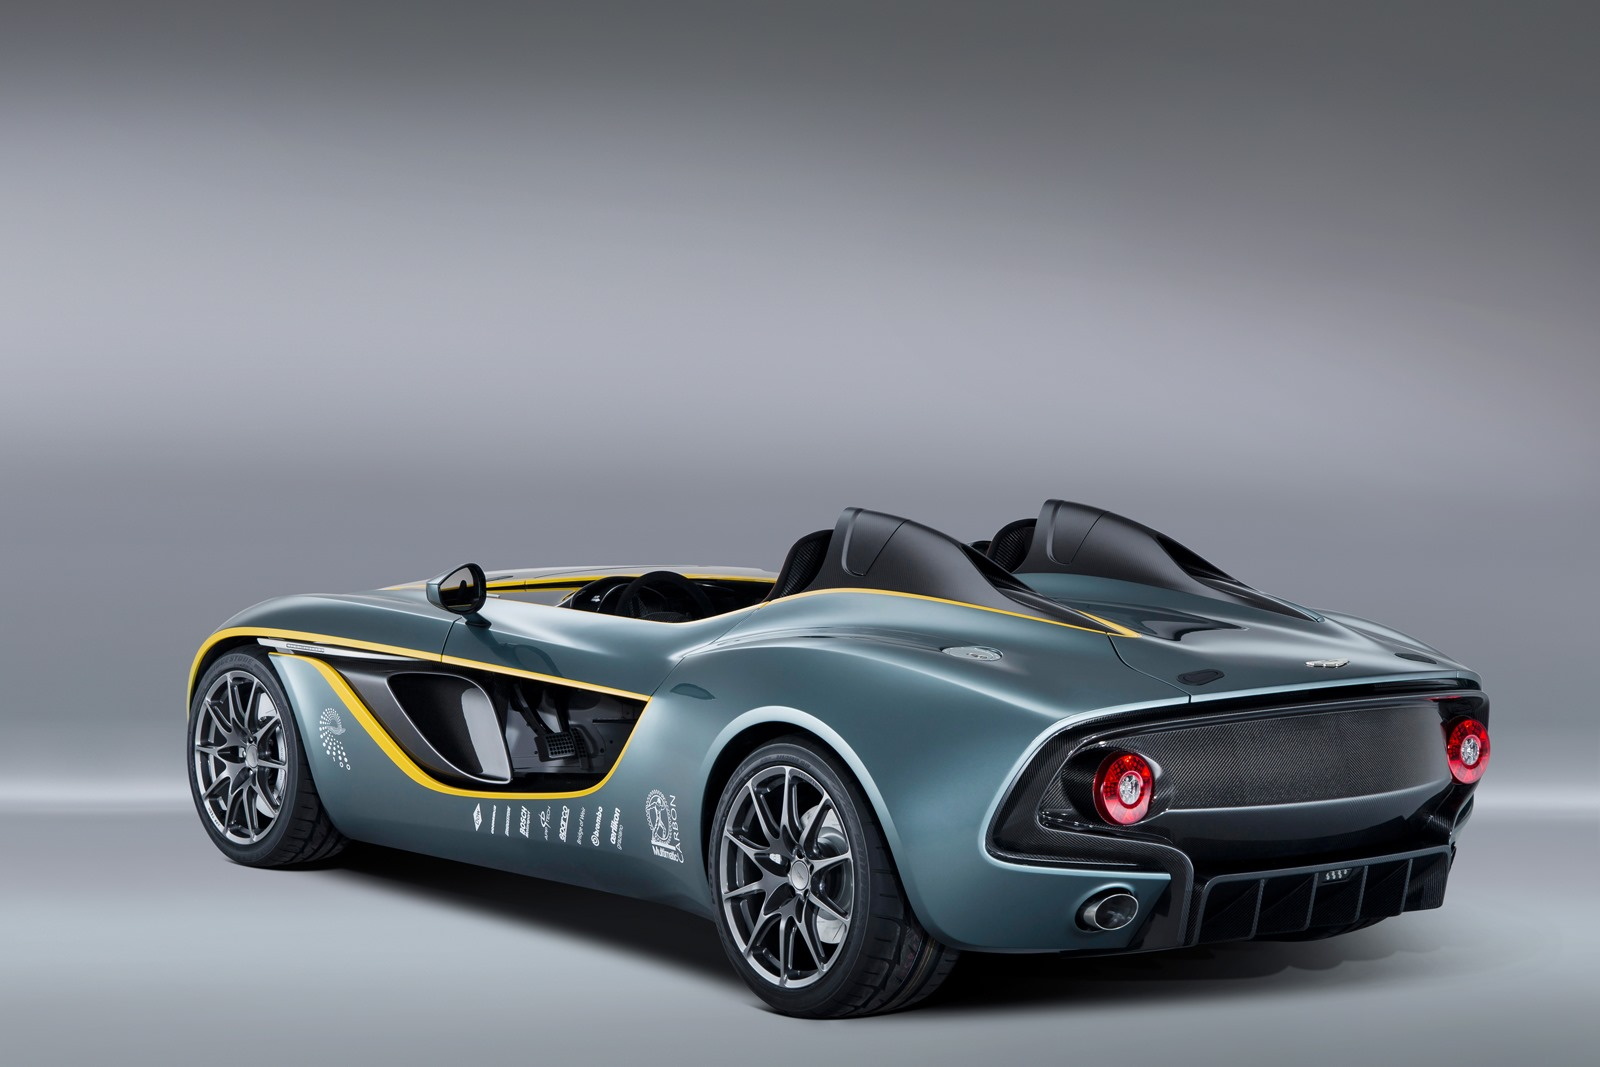 Aston Martin Cc Speedster Concept